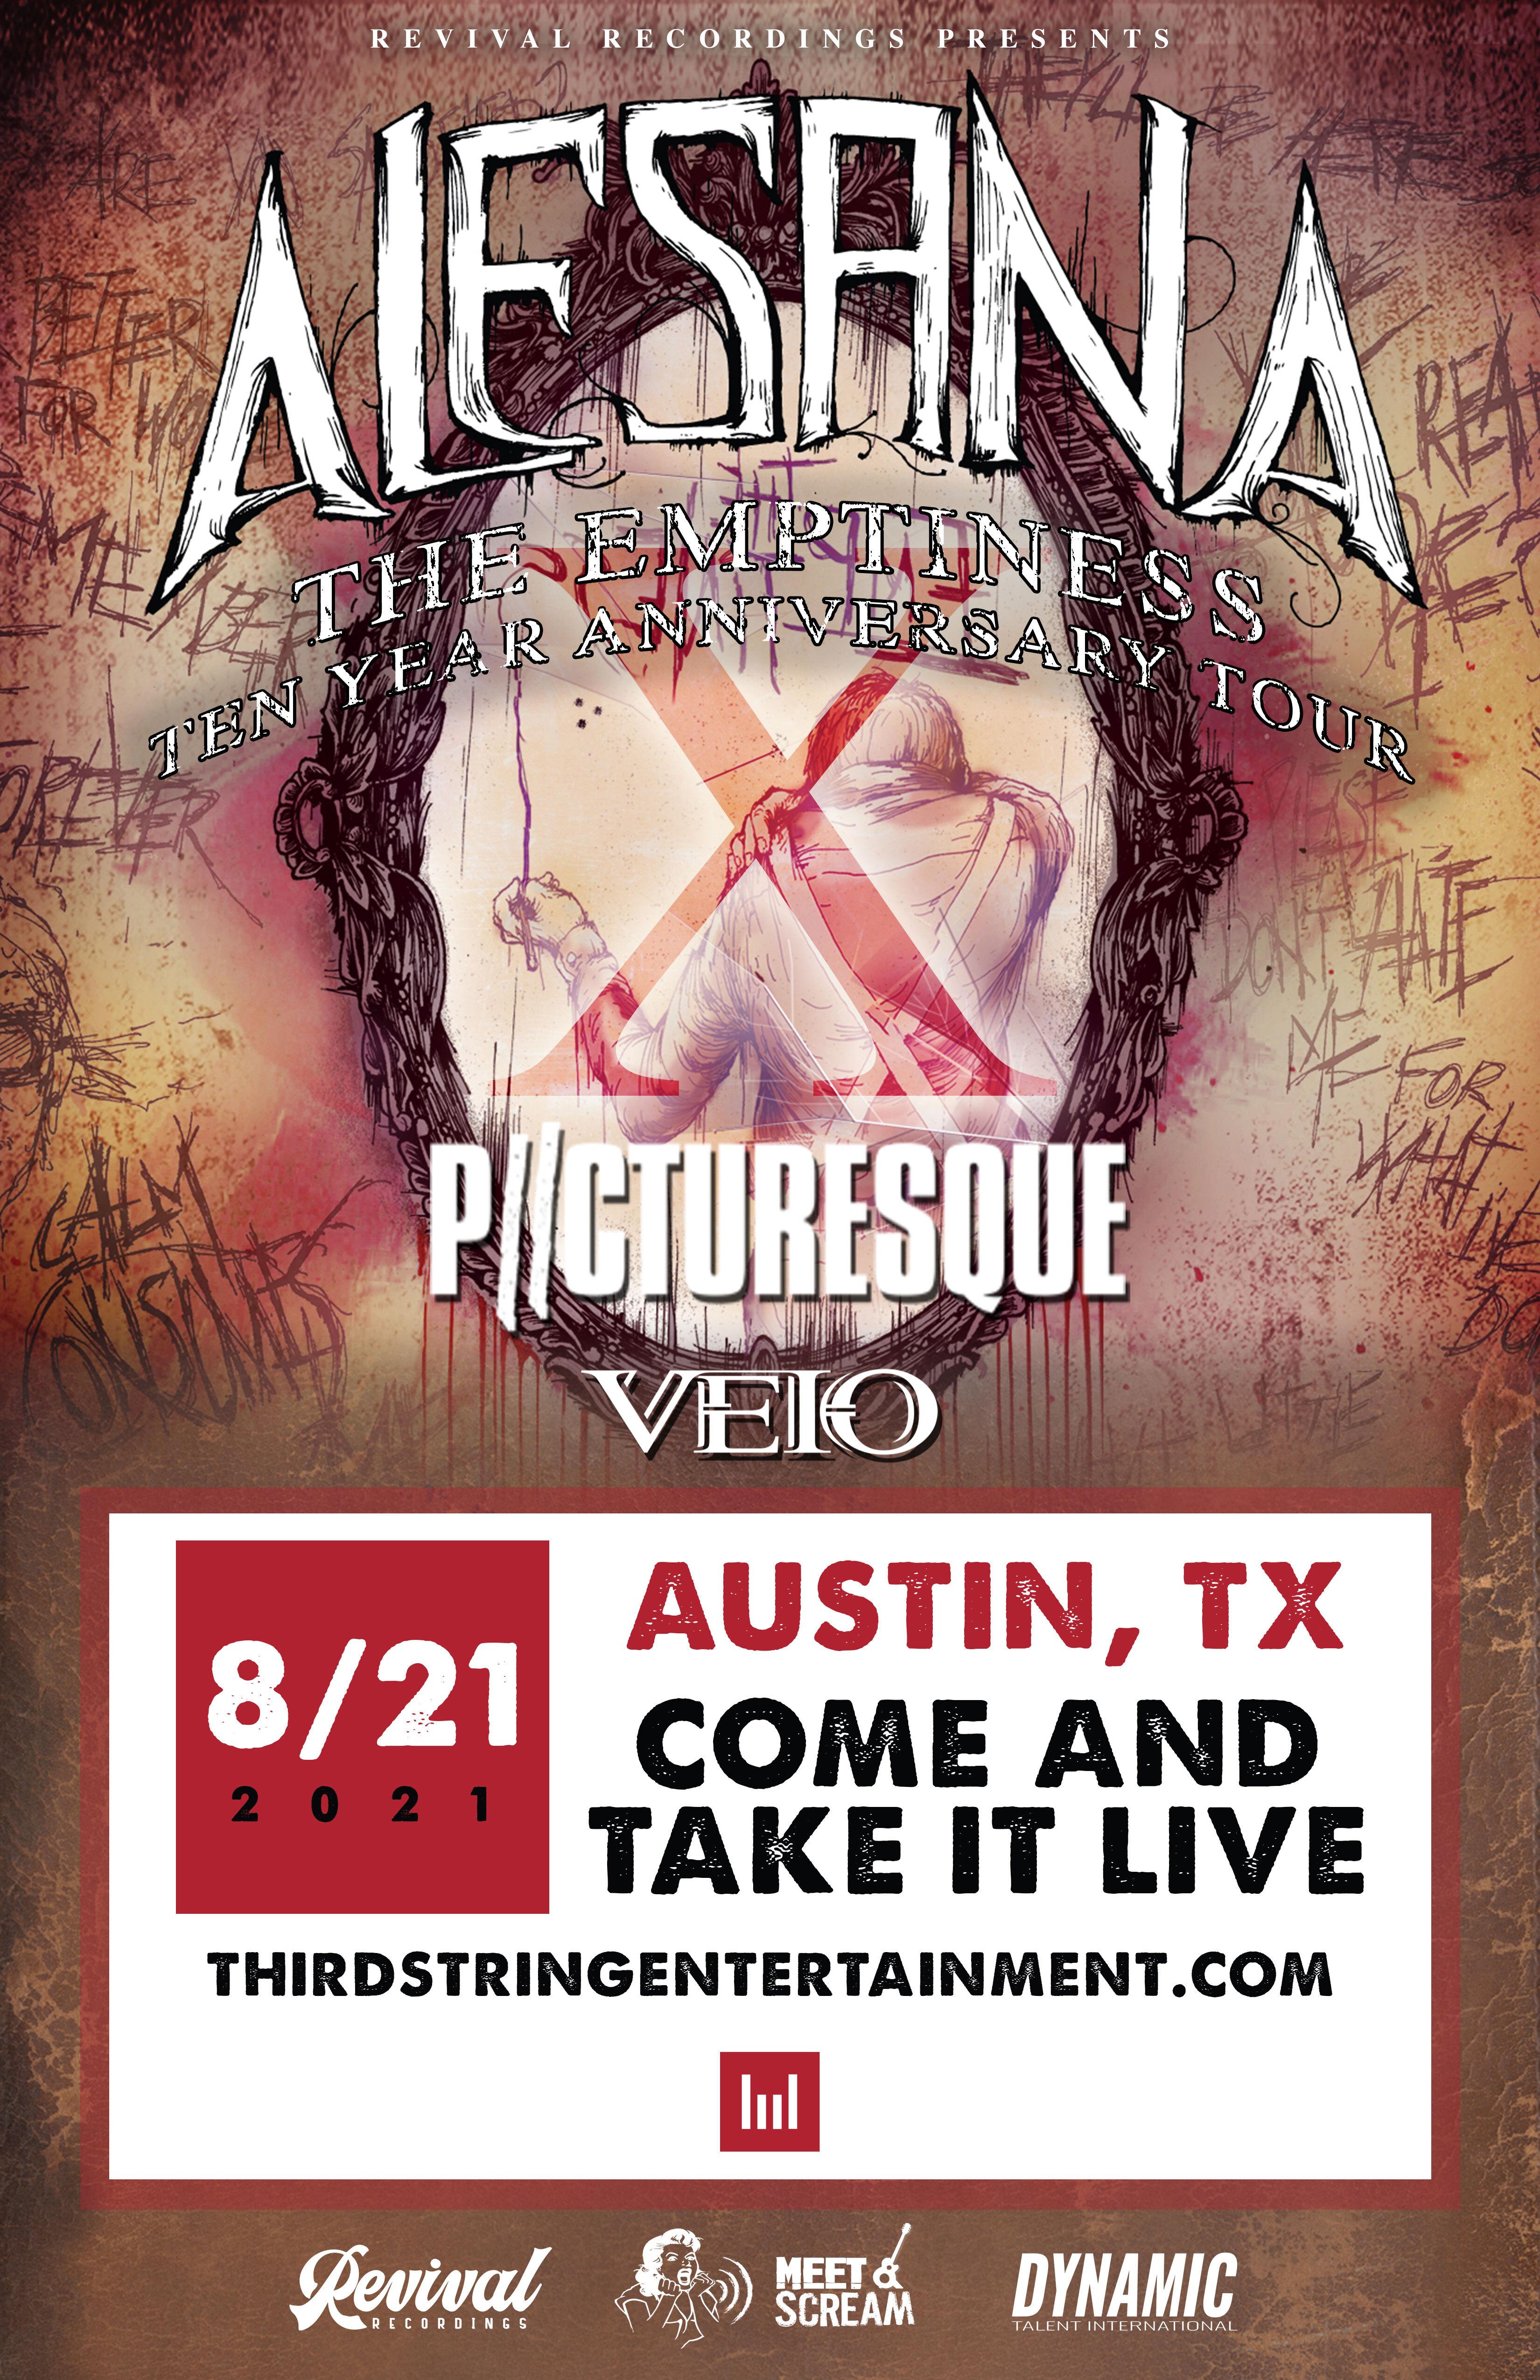 Postponed: Alesana (New Date TBD):